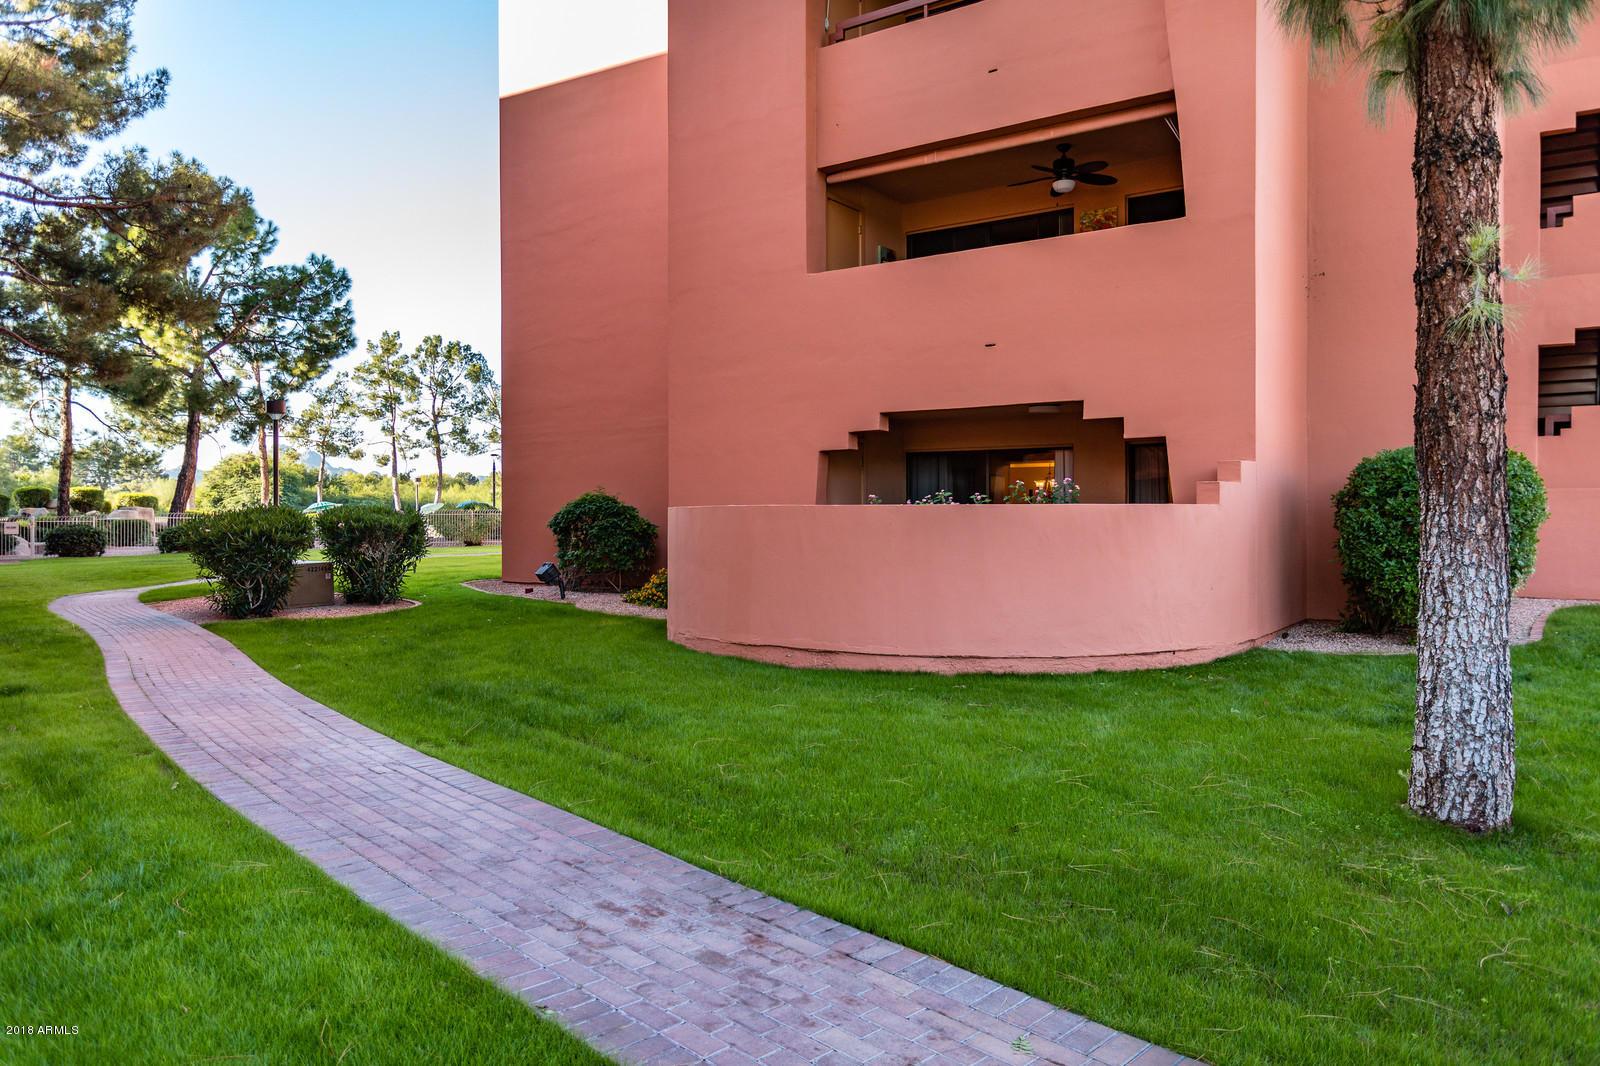 12212 N Paradise Village Parkway W, Unit 142, Phoenix AZ 85032 - Photo 1